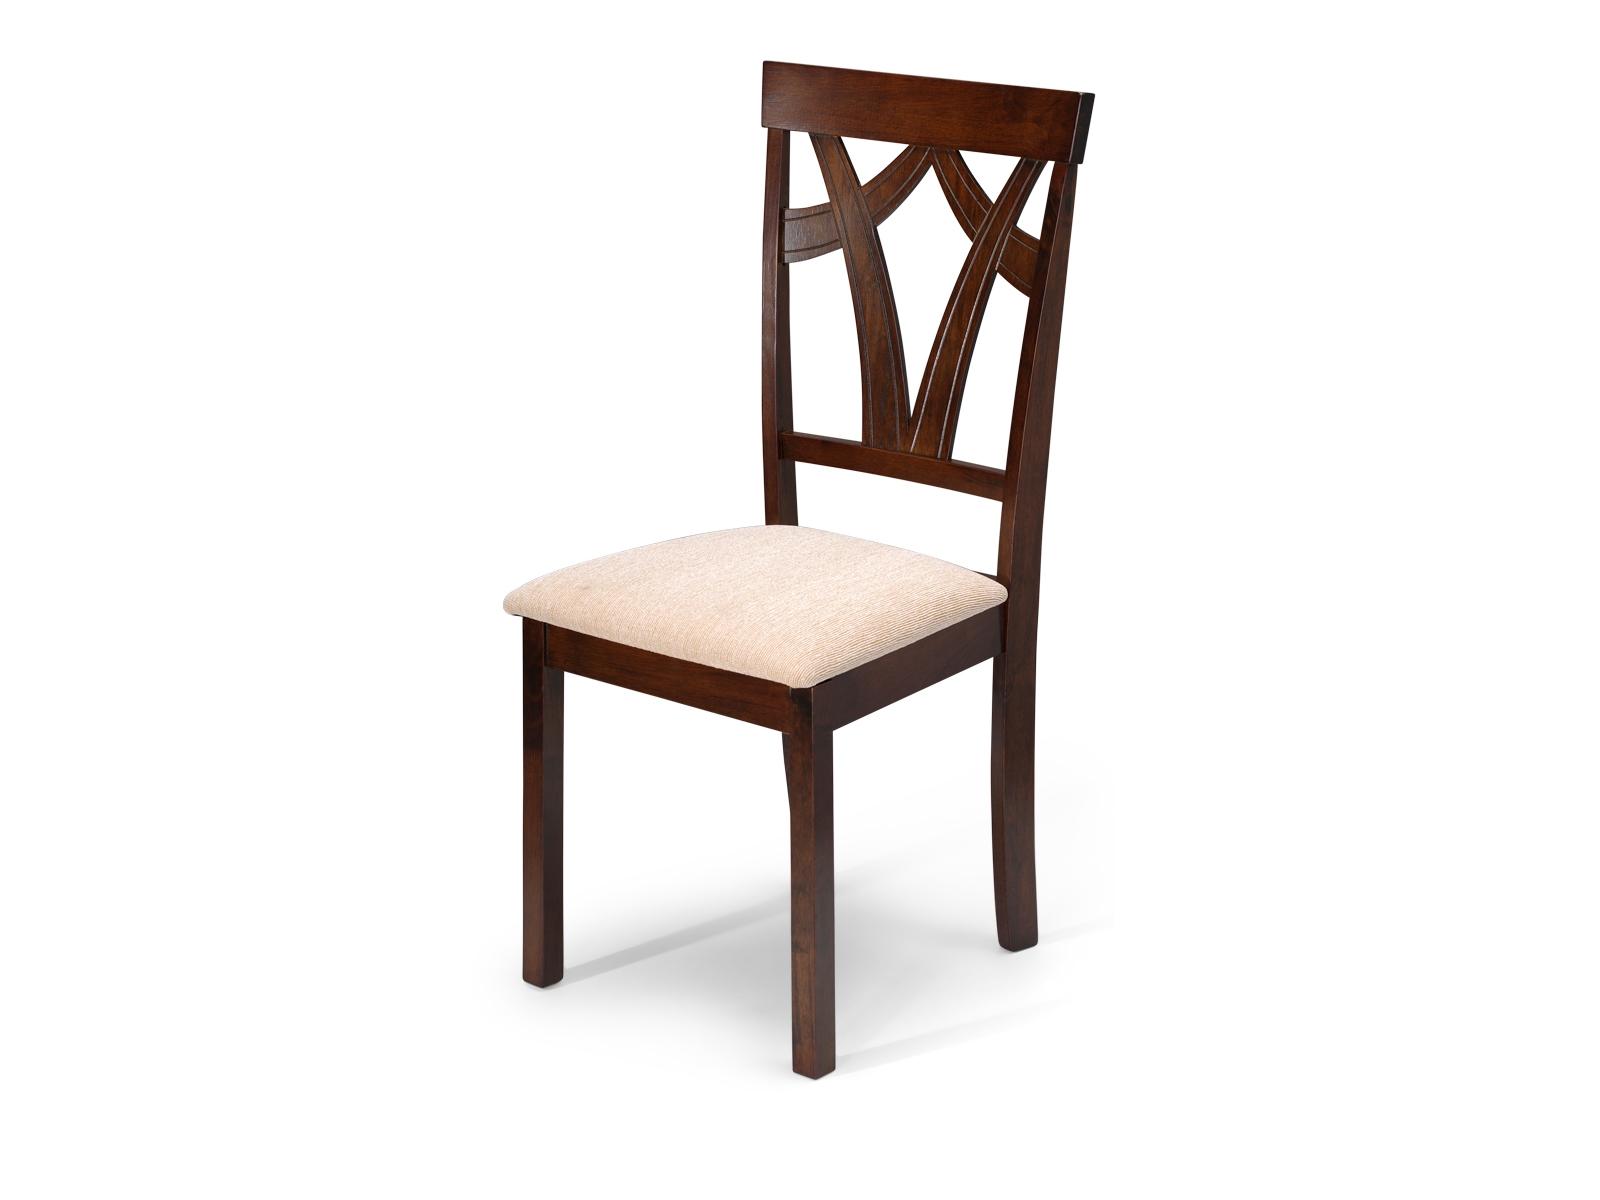 Scaun din lemn cu sezut tapitat cu stofa Arthur Dirty Oak/Beige l43xA385xH945 cm